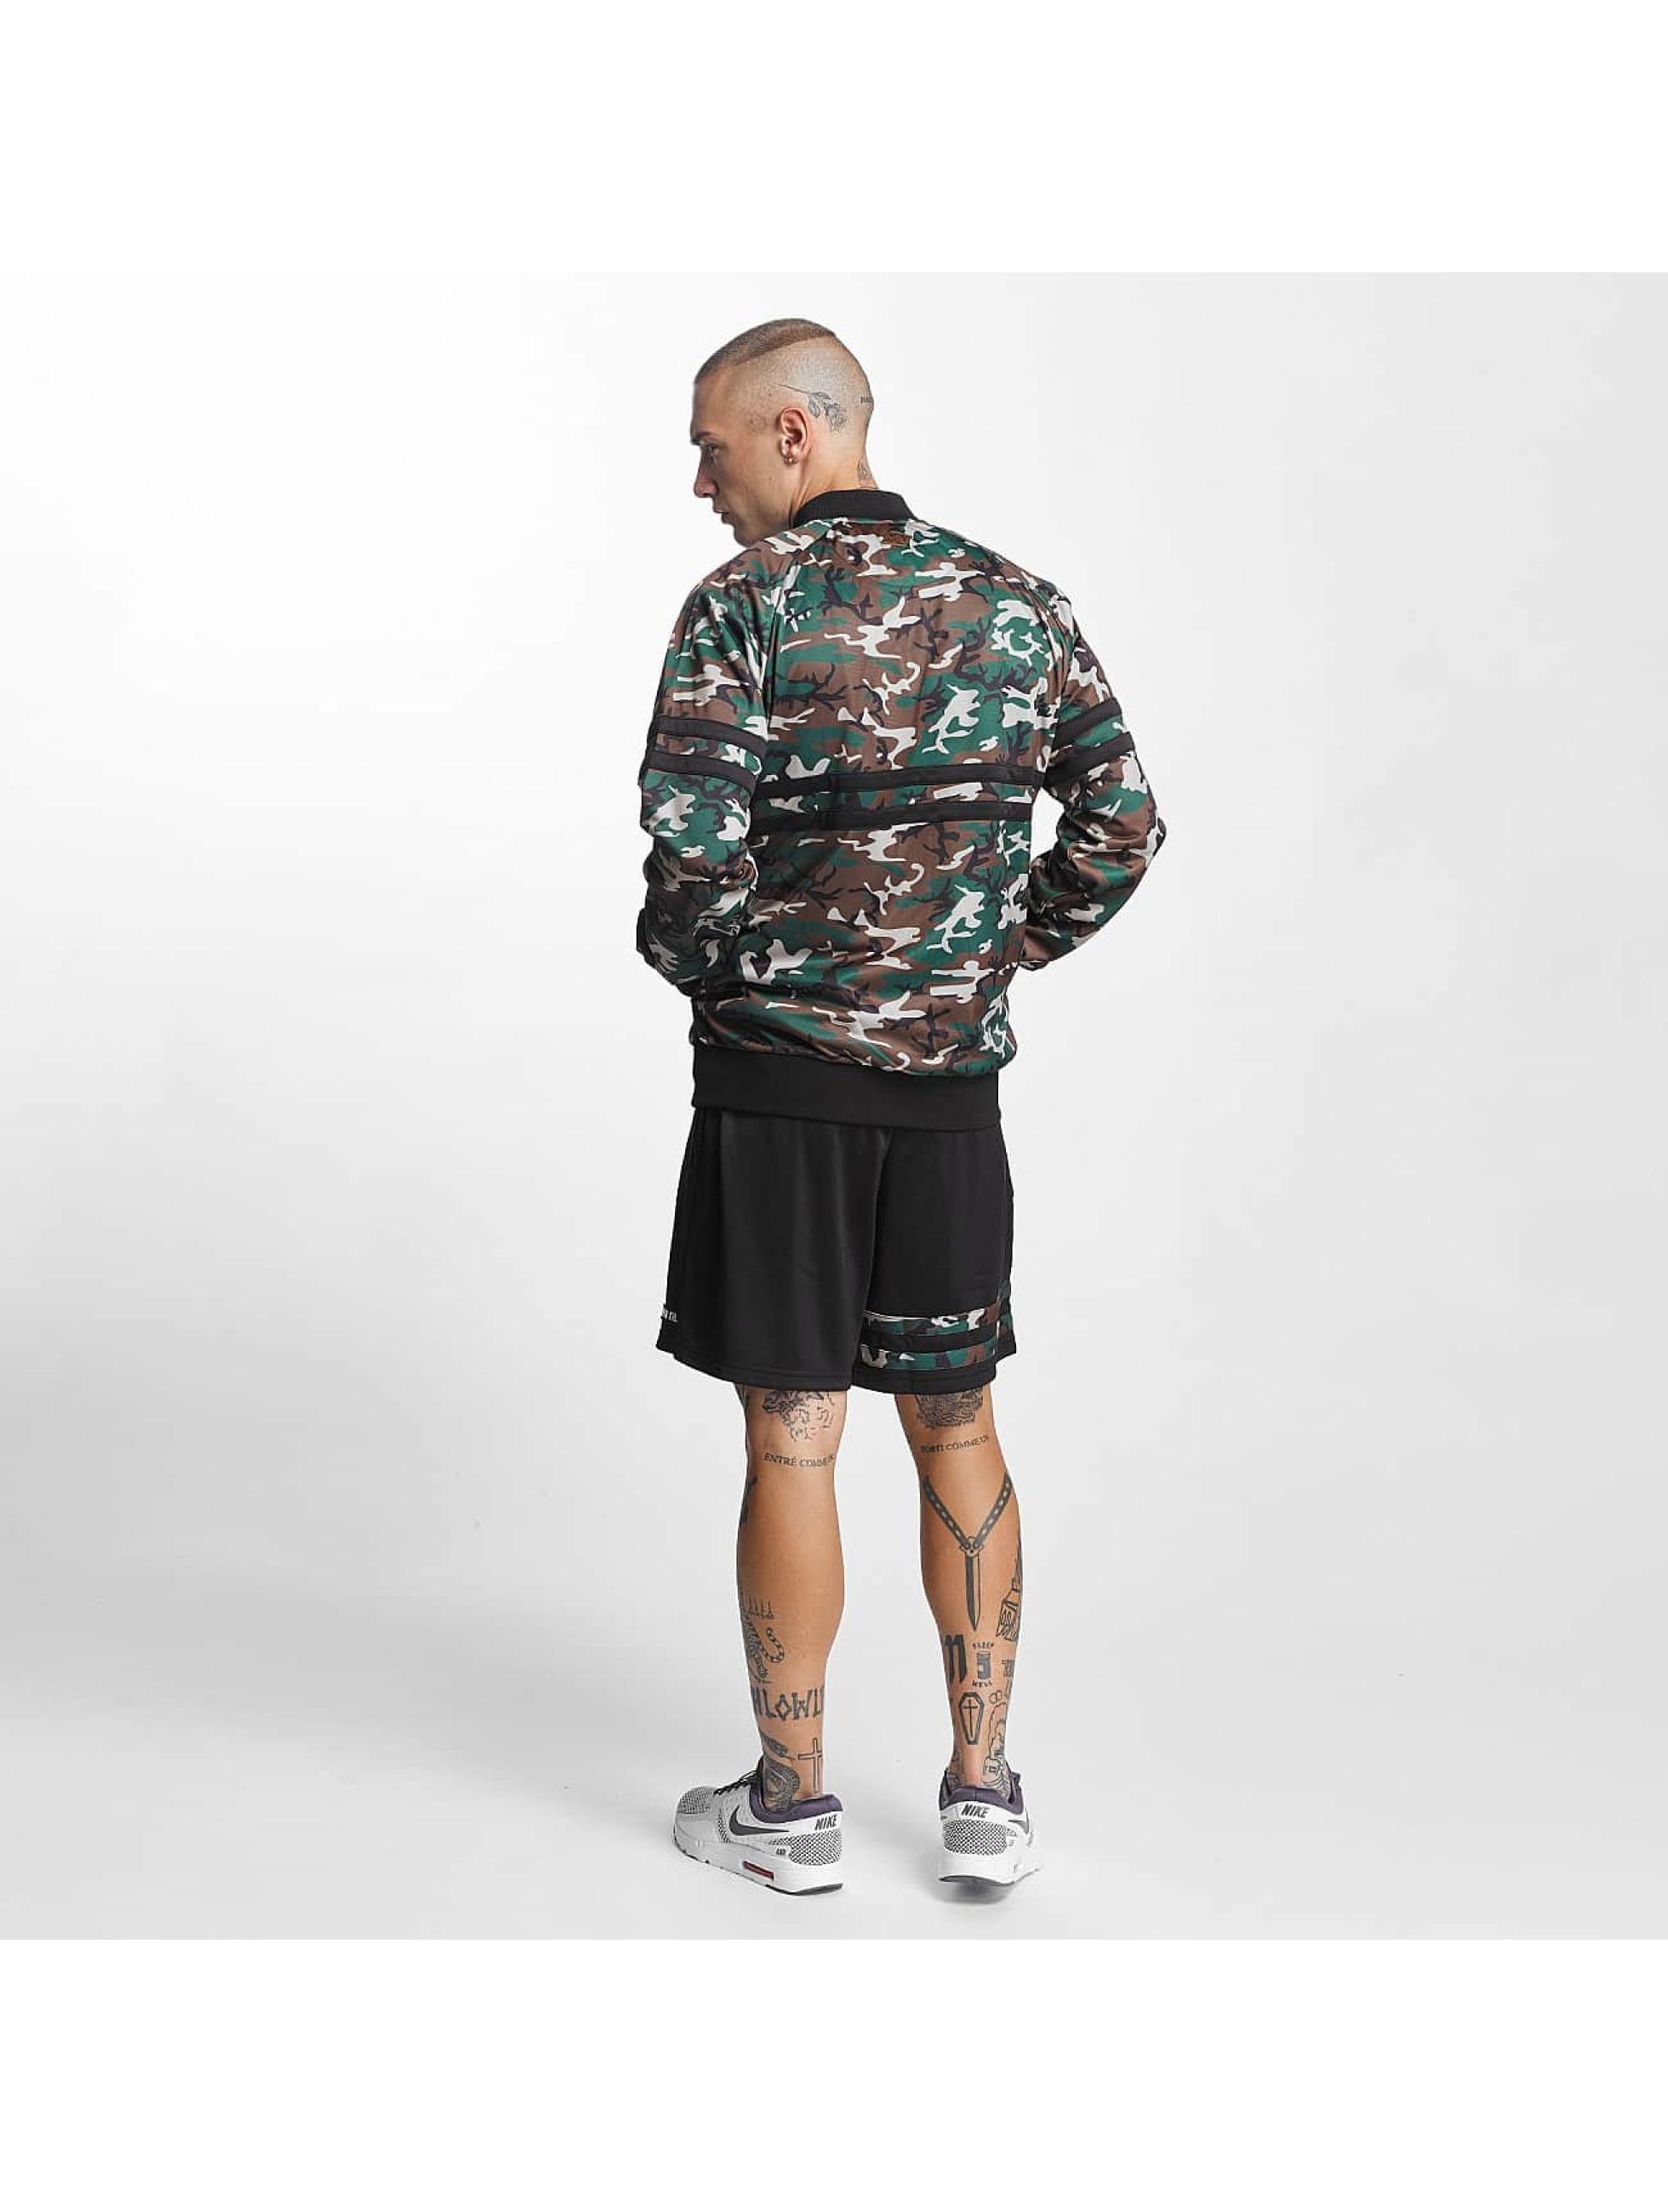 UNFAIR ATHLETICS Übergangsjacke DMWU Tracktop camouflage